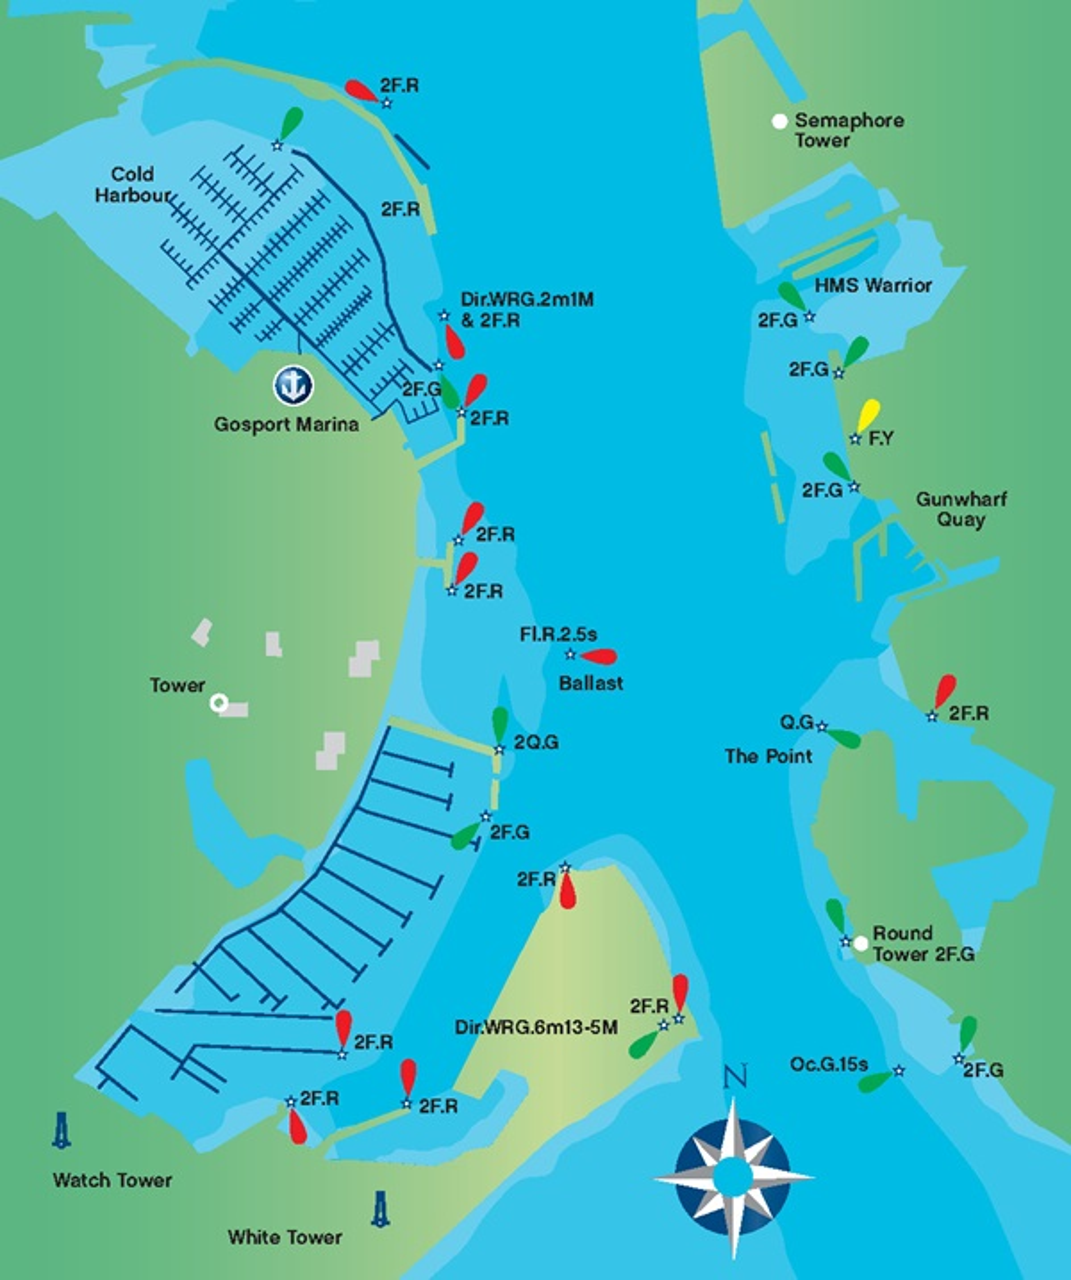 The approach to Gosport marina